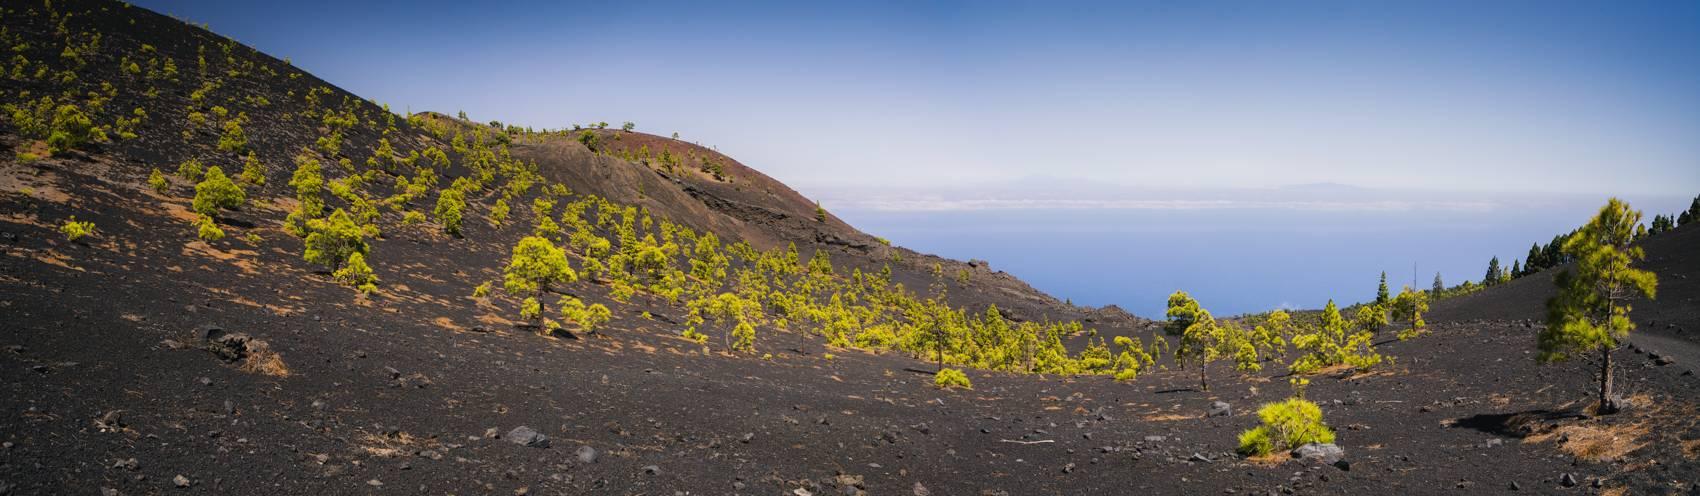 Photo Voyages : Îles Canaries #20